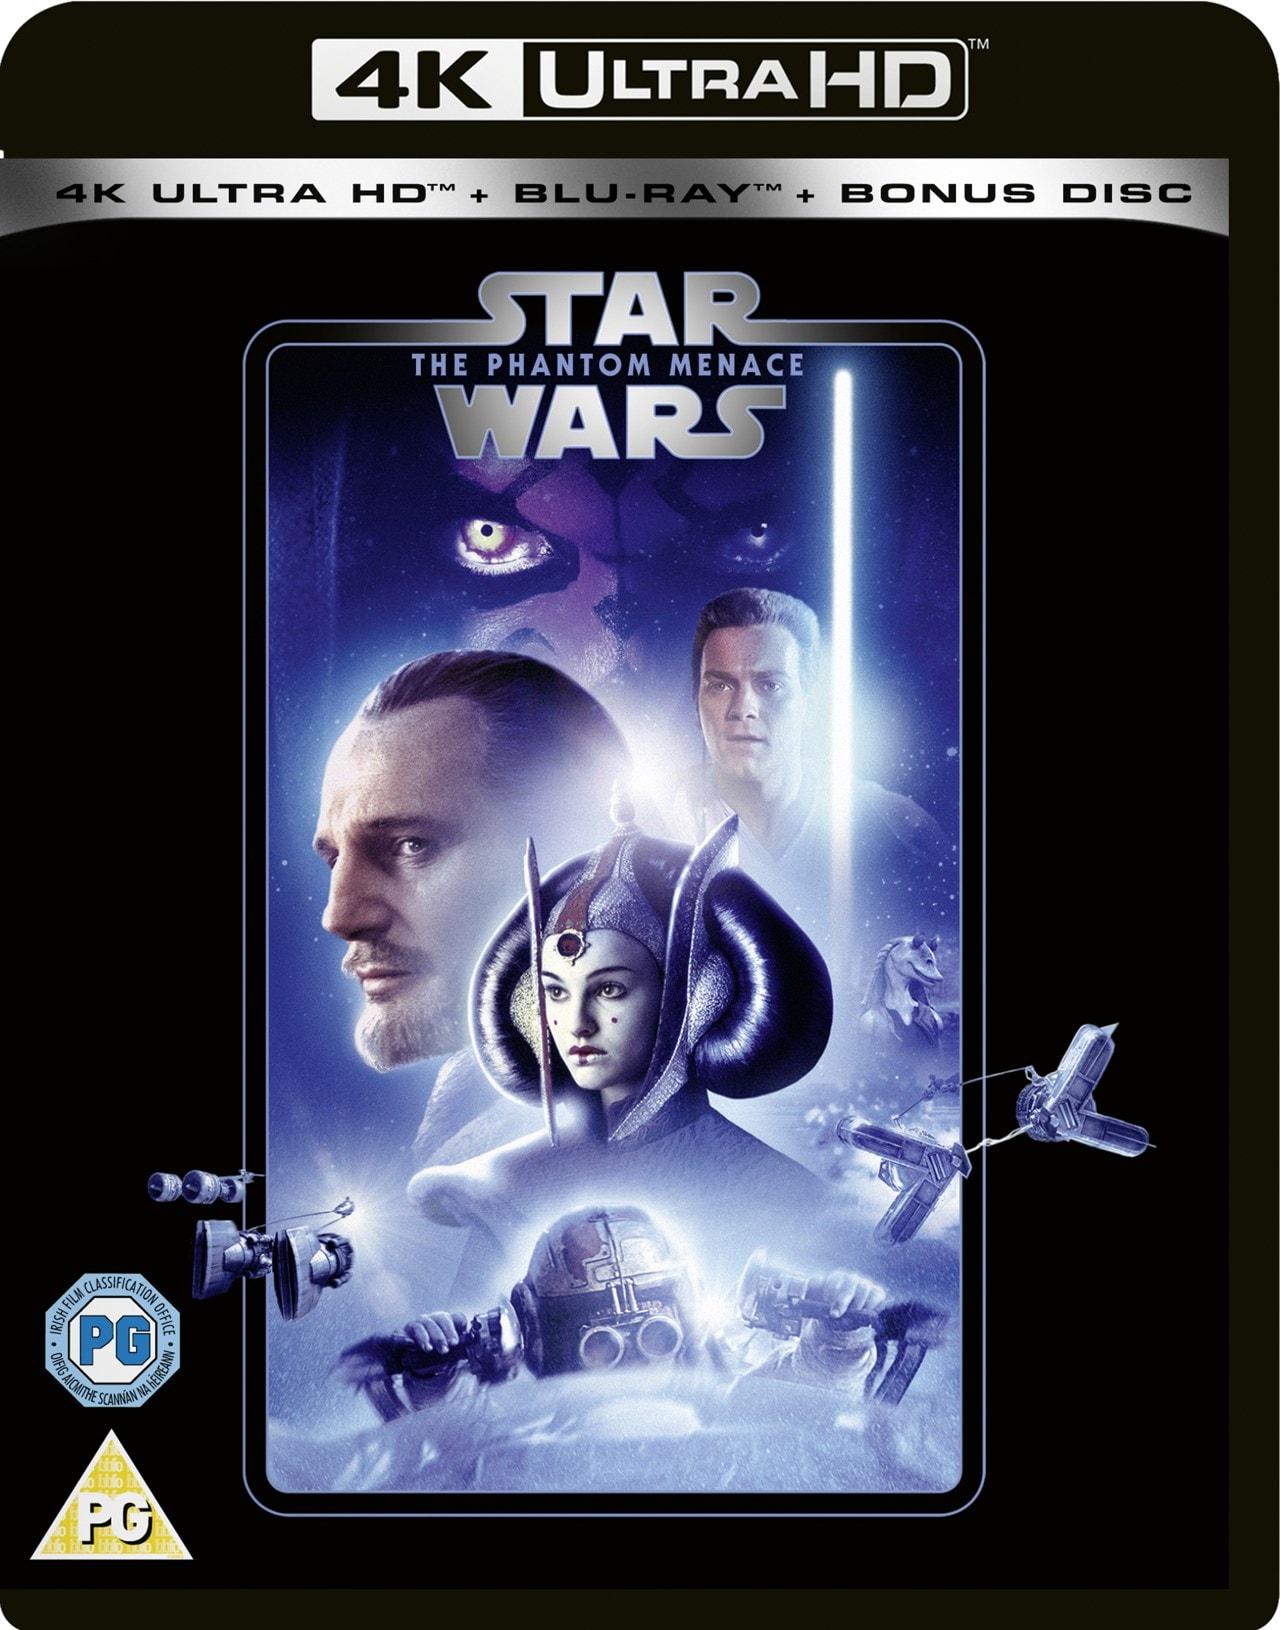 Star Wars: Episode I - The Phantom Menace - 1